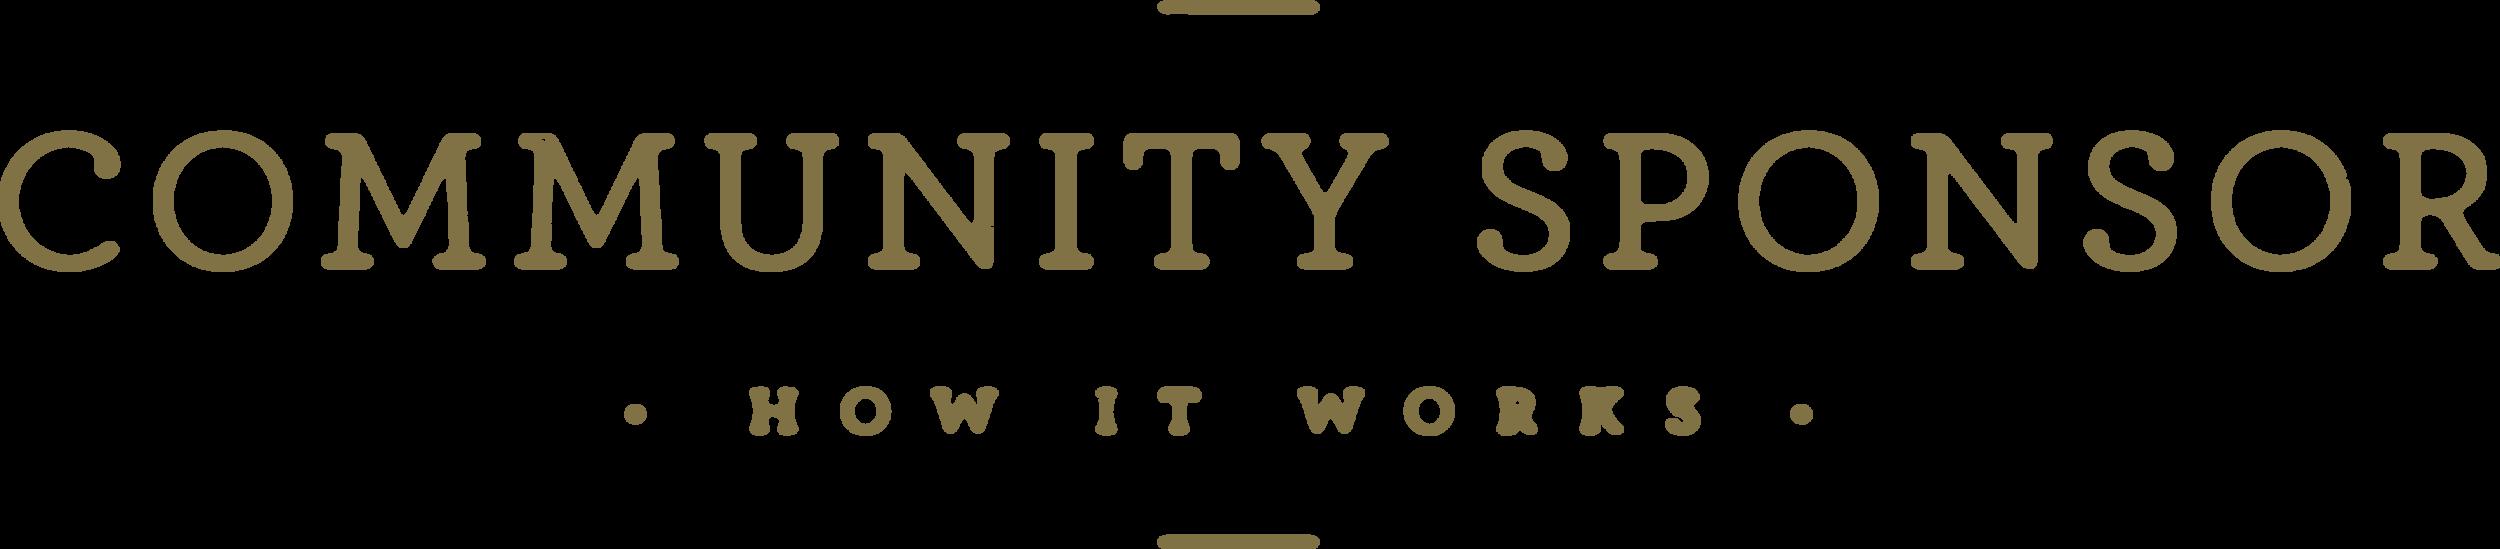 Community-Sponsor_0002_brass.png